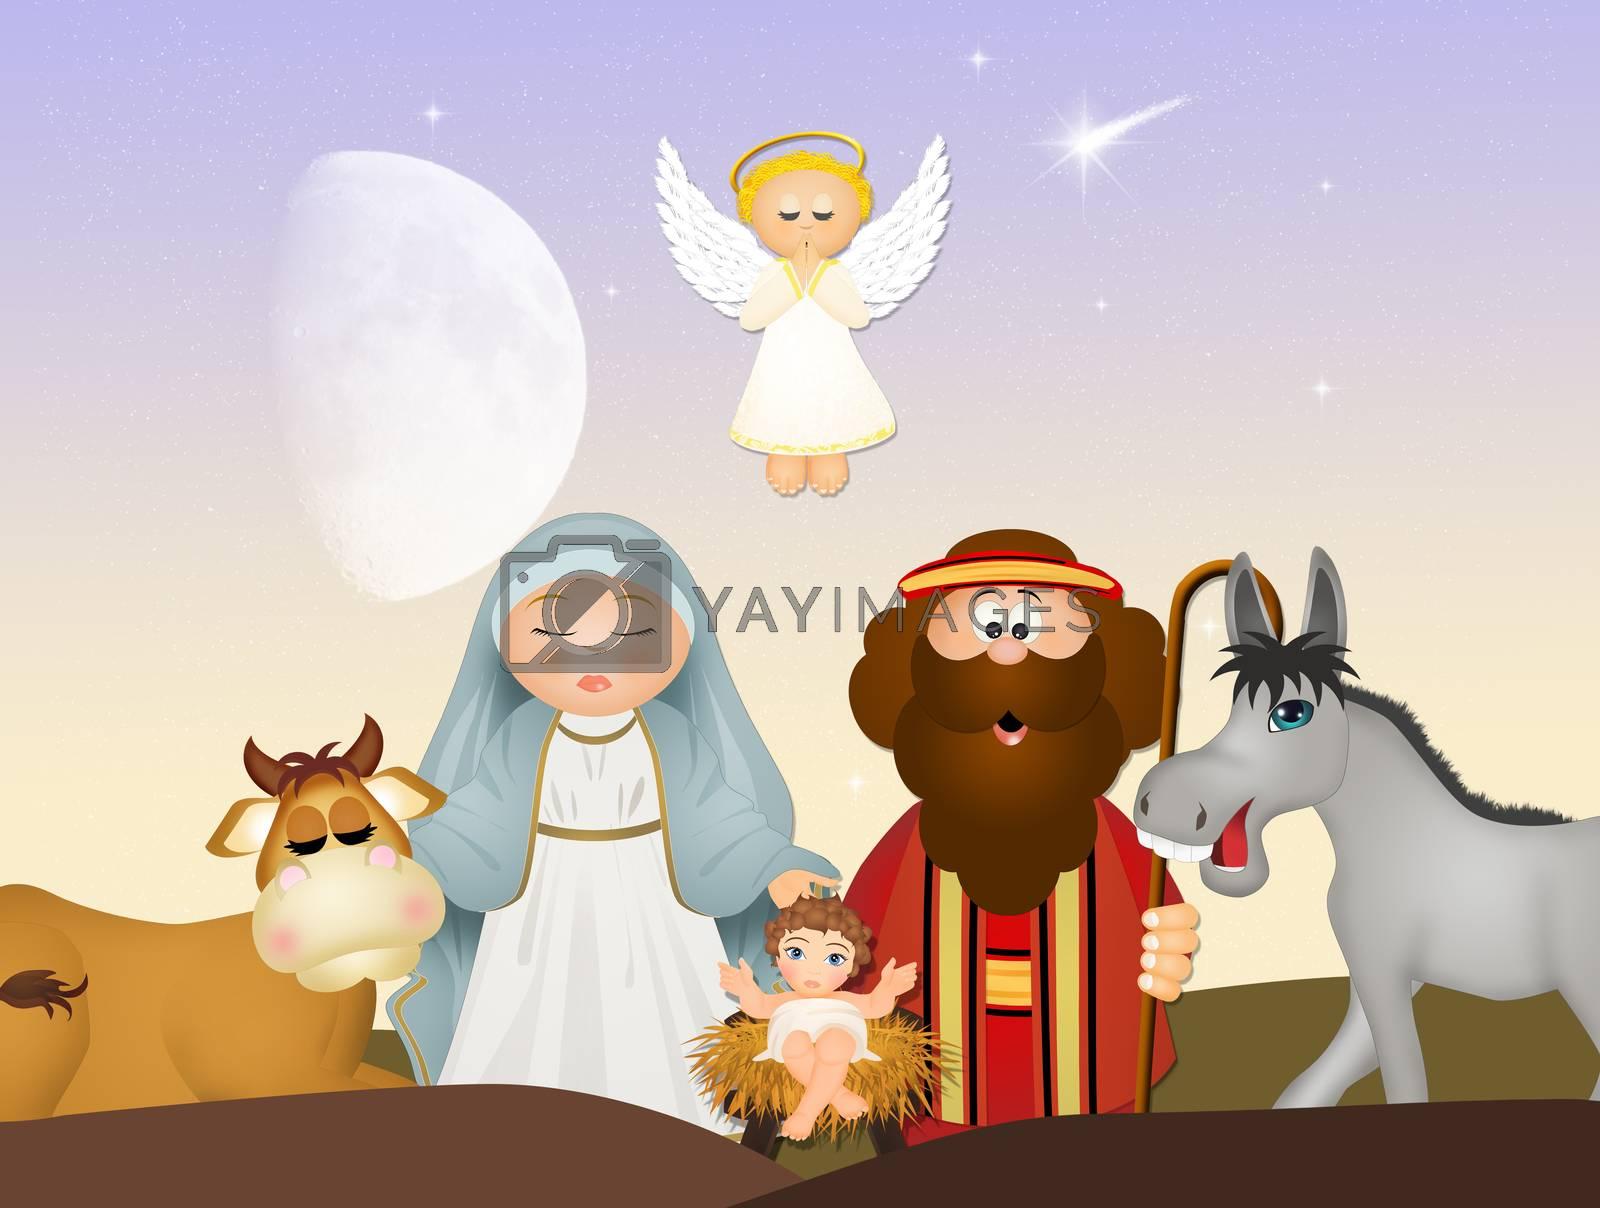 illustration of Christmas Nativity scene with angel